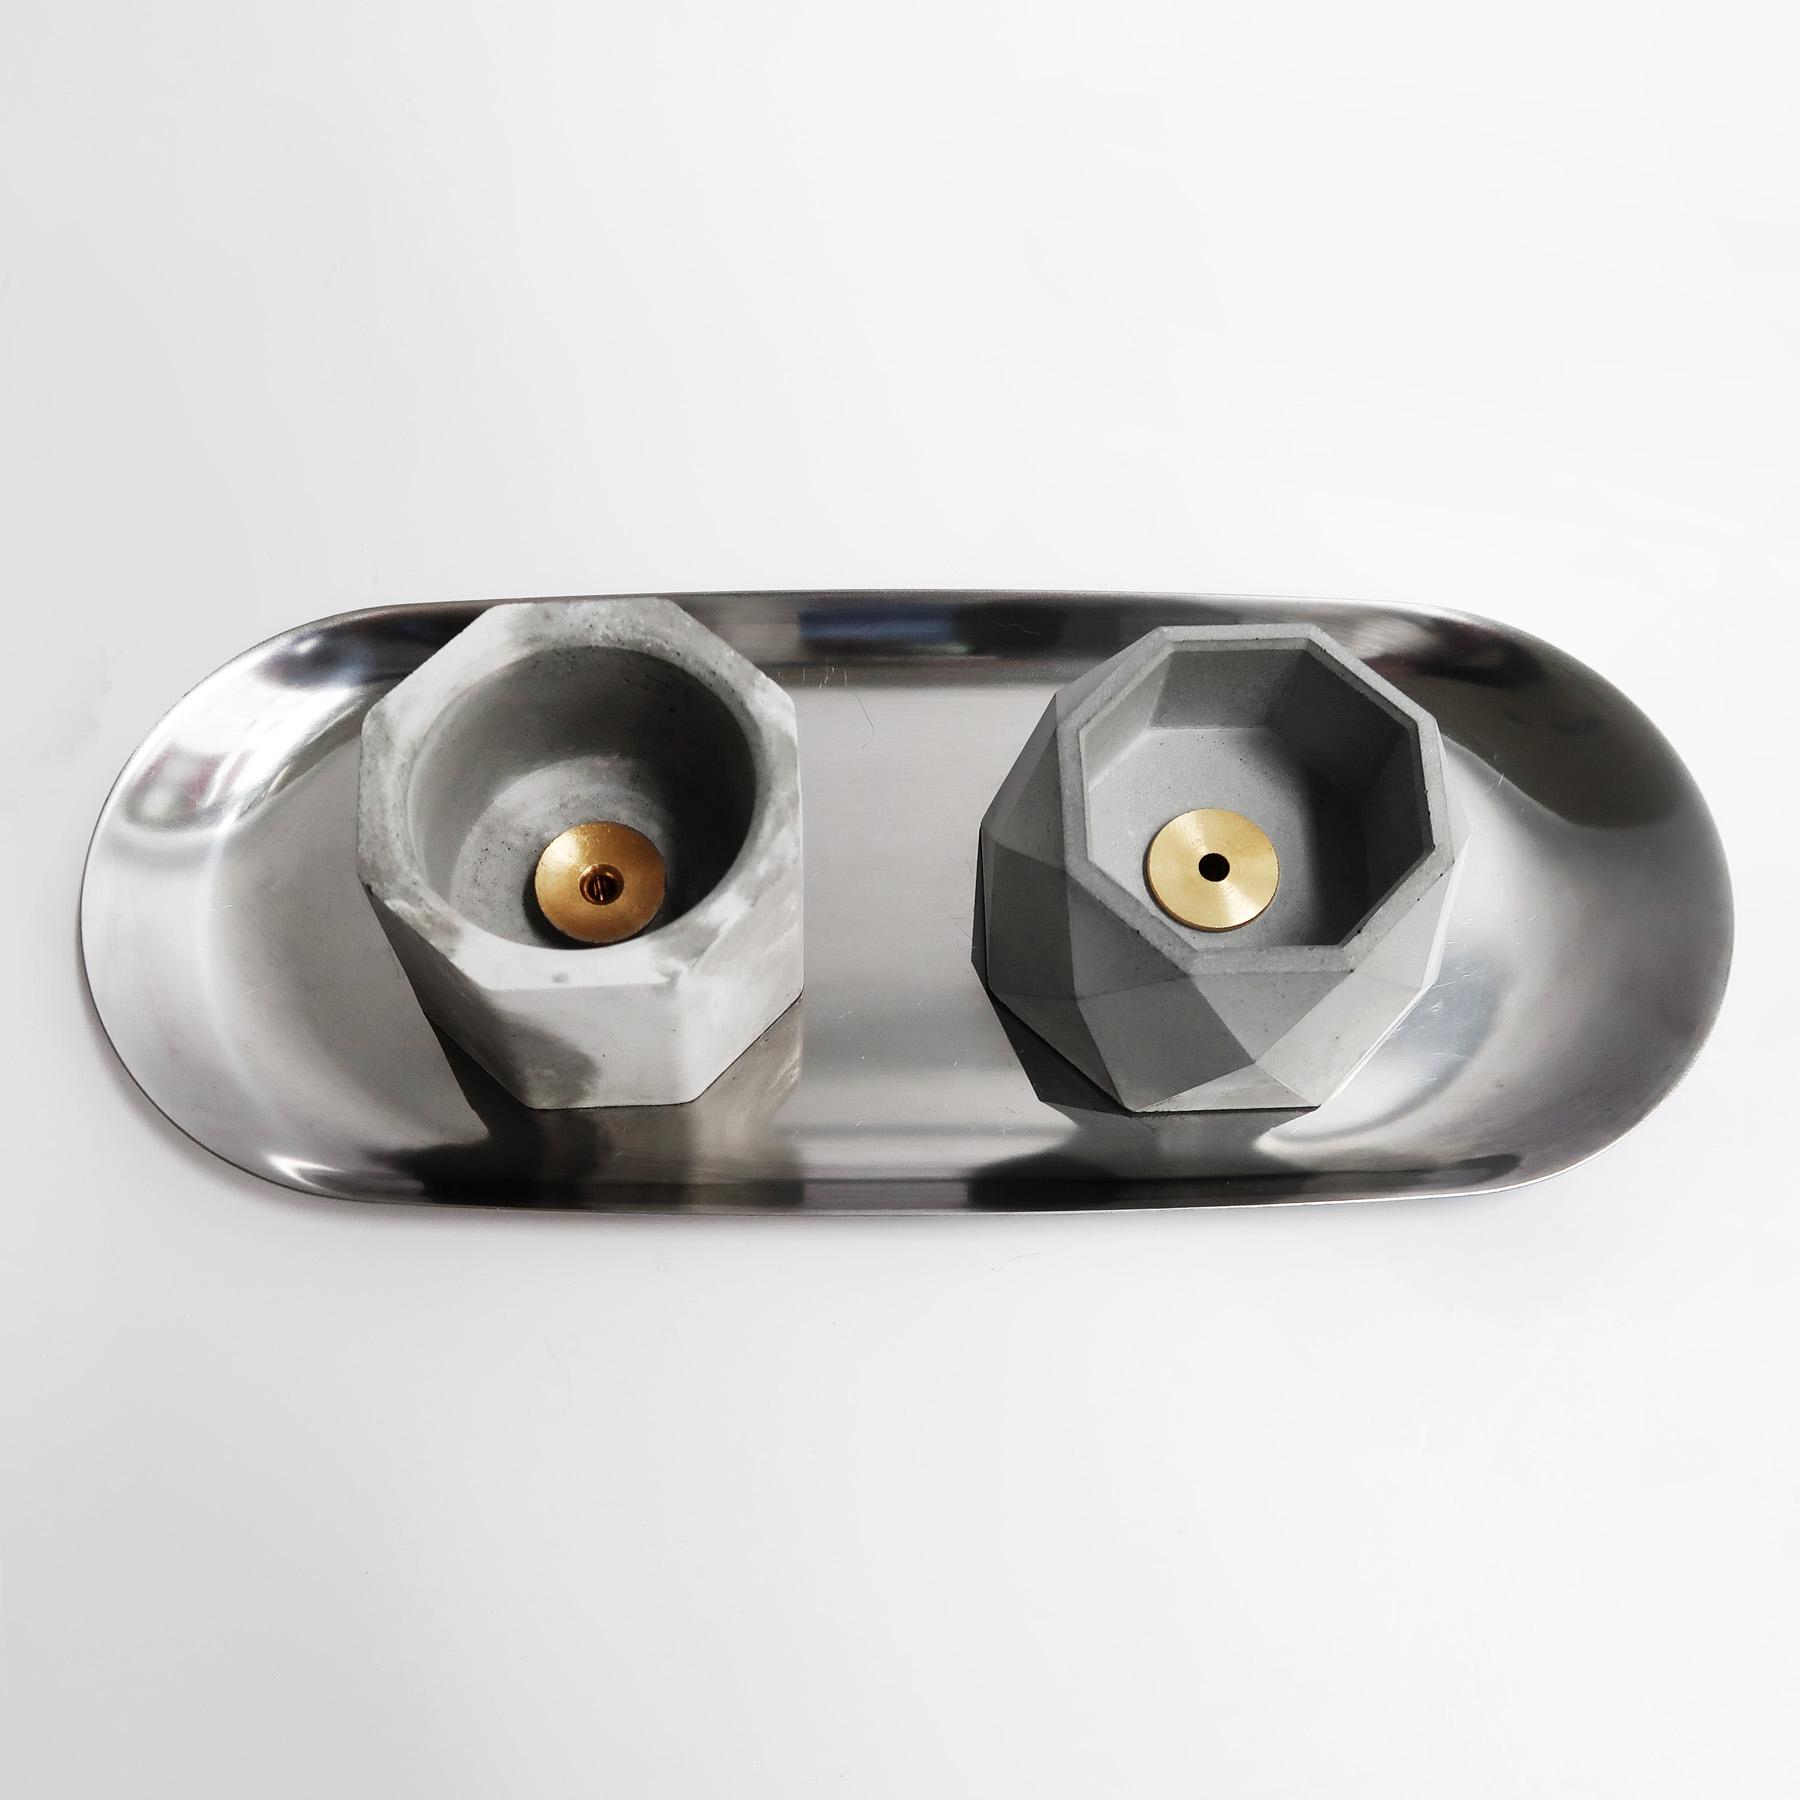 BLOOMING 多用途水泥銅座盆器・線香燭台・收納盤